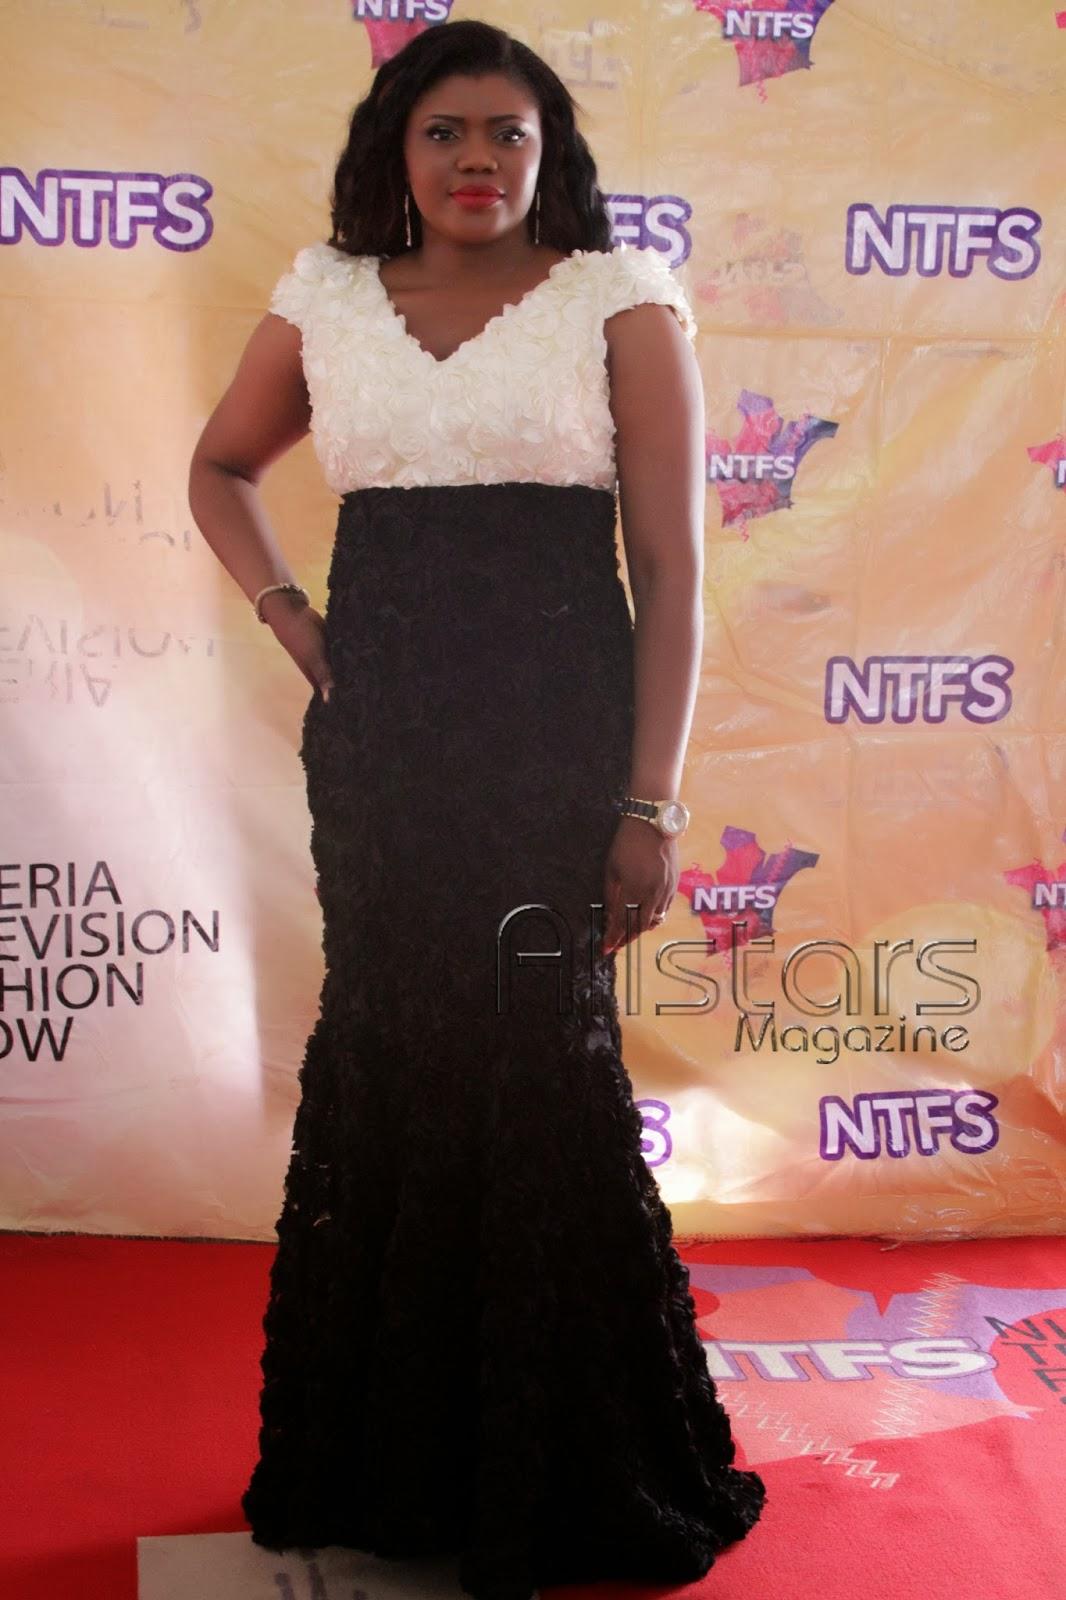 Allstars Magazine Gorgeous Costumes Nigeria Television Fashion Show Ntfs September 2013